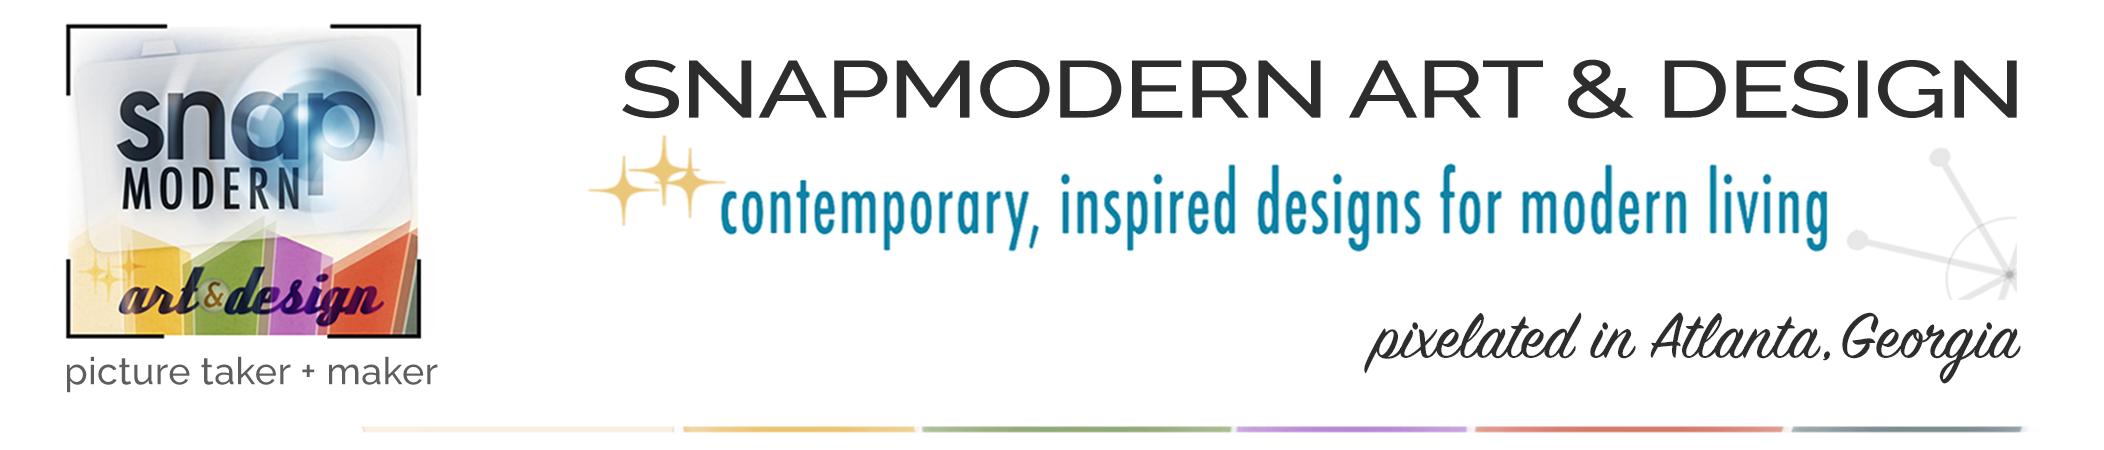 SnapModern Art & Design